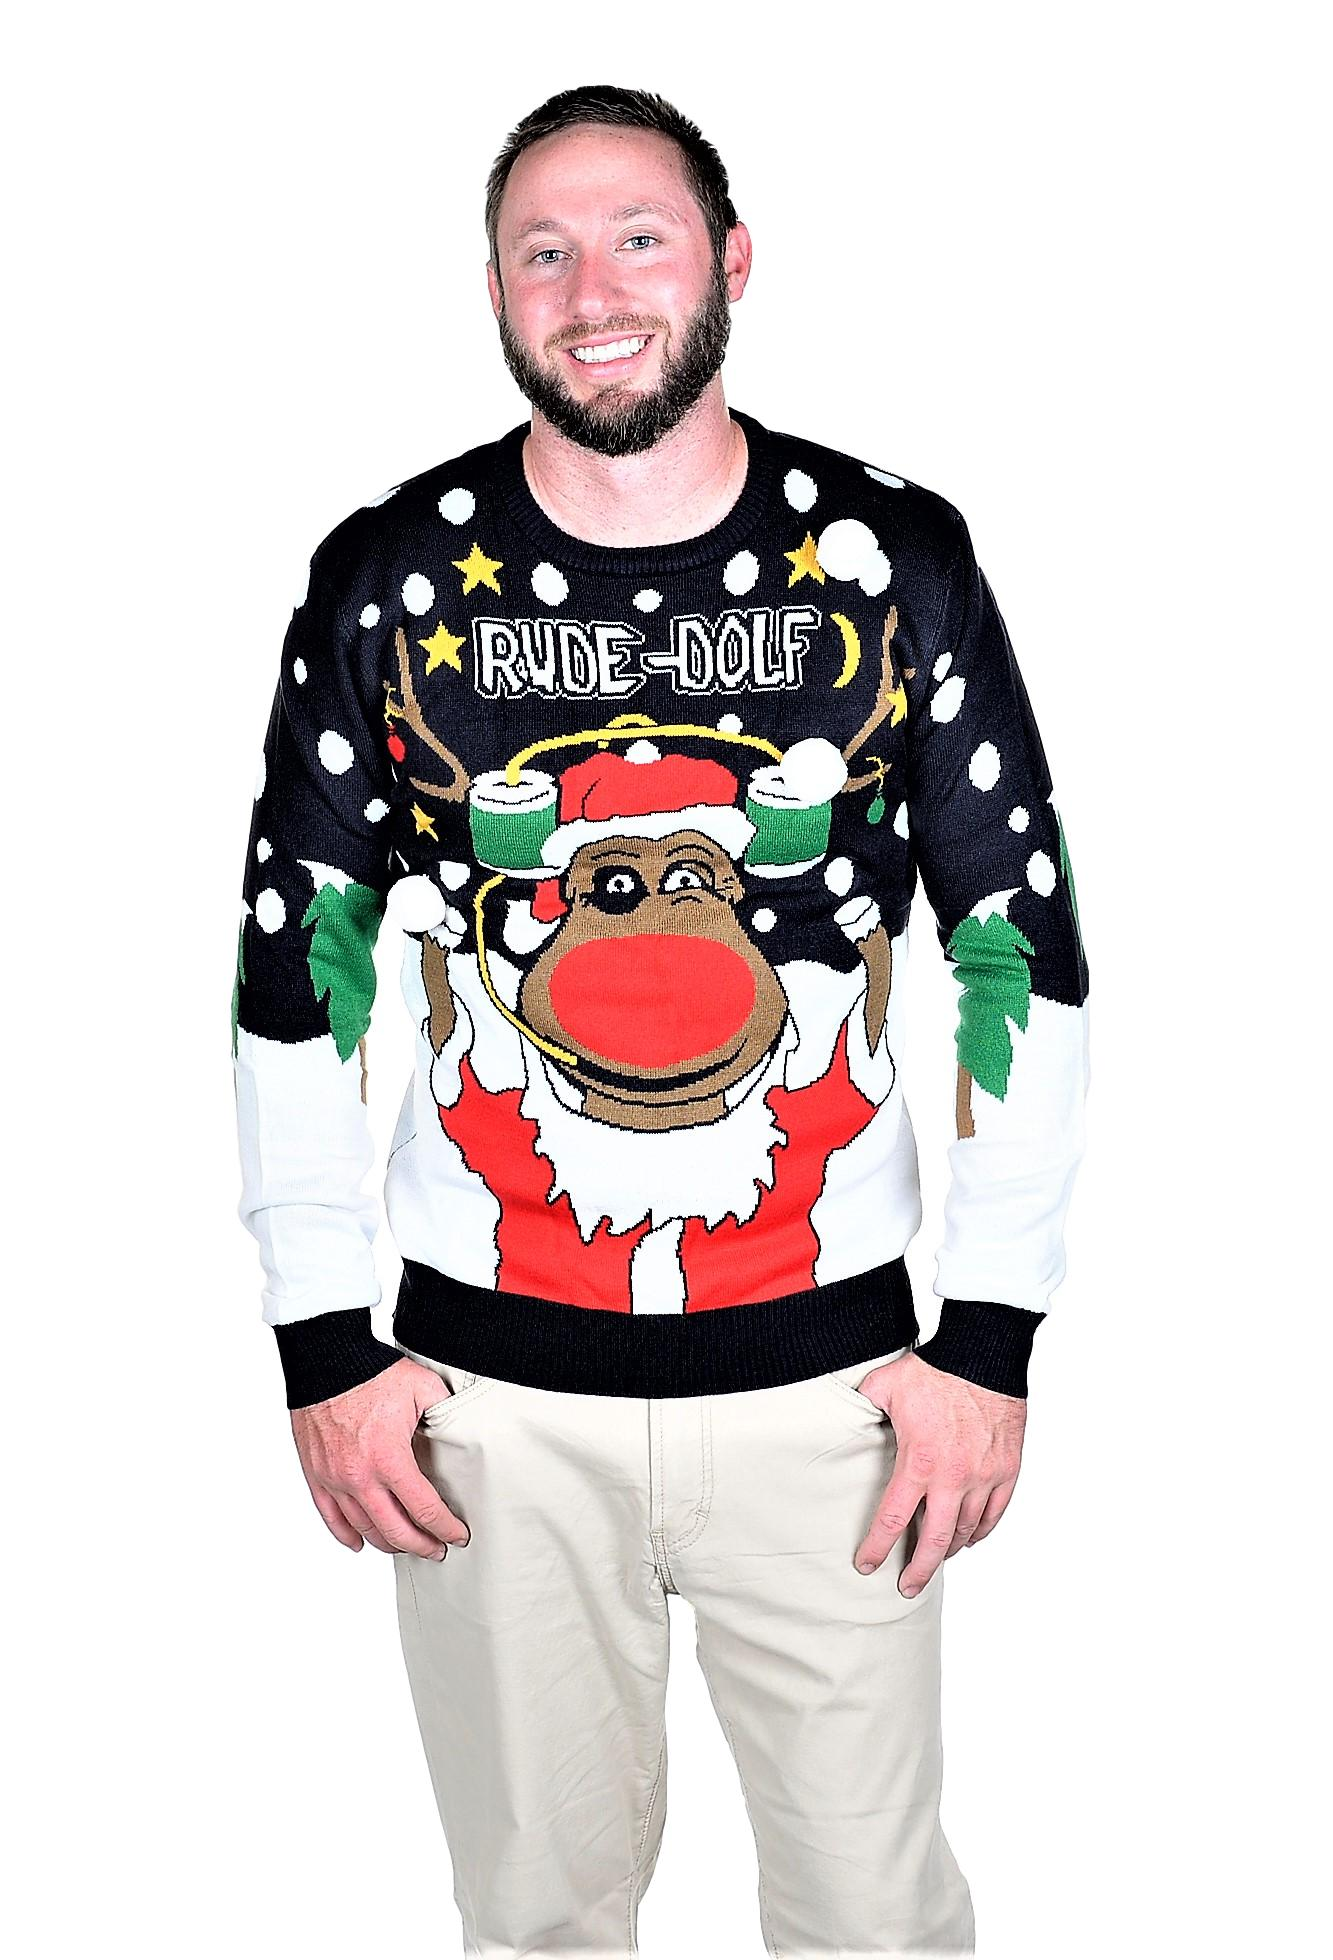 RWB RUDE DOLF Ugly Christmas Sweater Pullover Navy